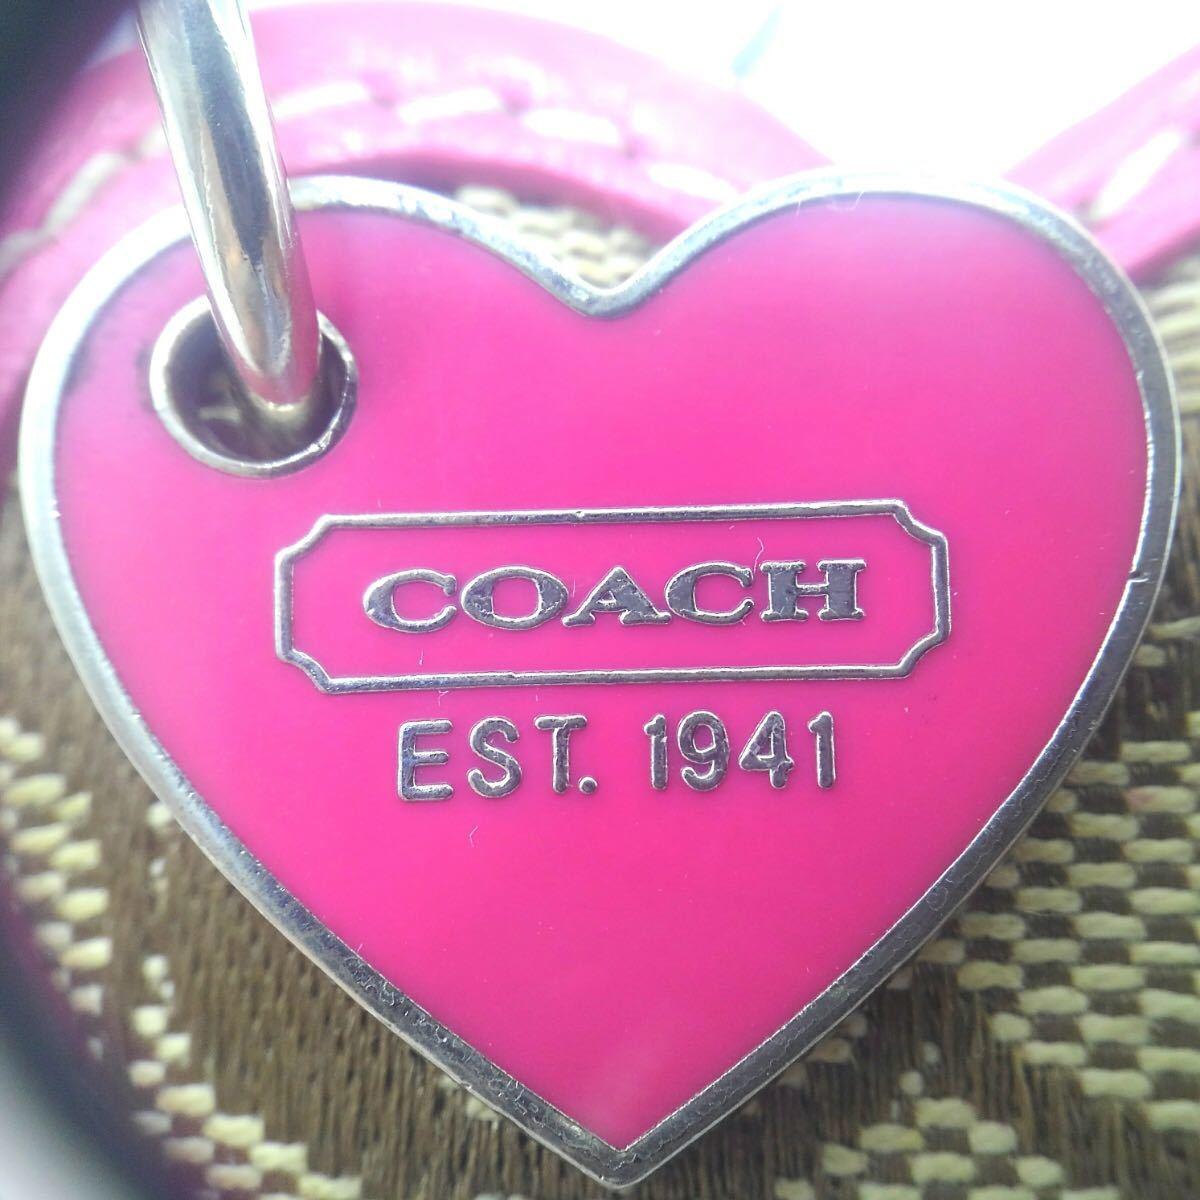 ◆COACH コーチ シグネチャー ハート キーホルダー◆レディースアクセサリー/バッグチャーム/ジャガード/レザー/小物/雑貨/美品/CB0_画像5